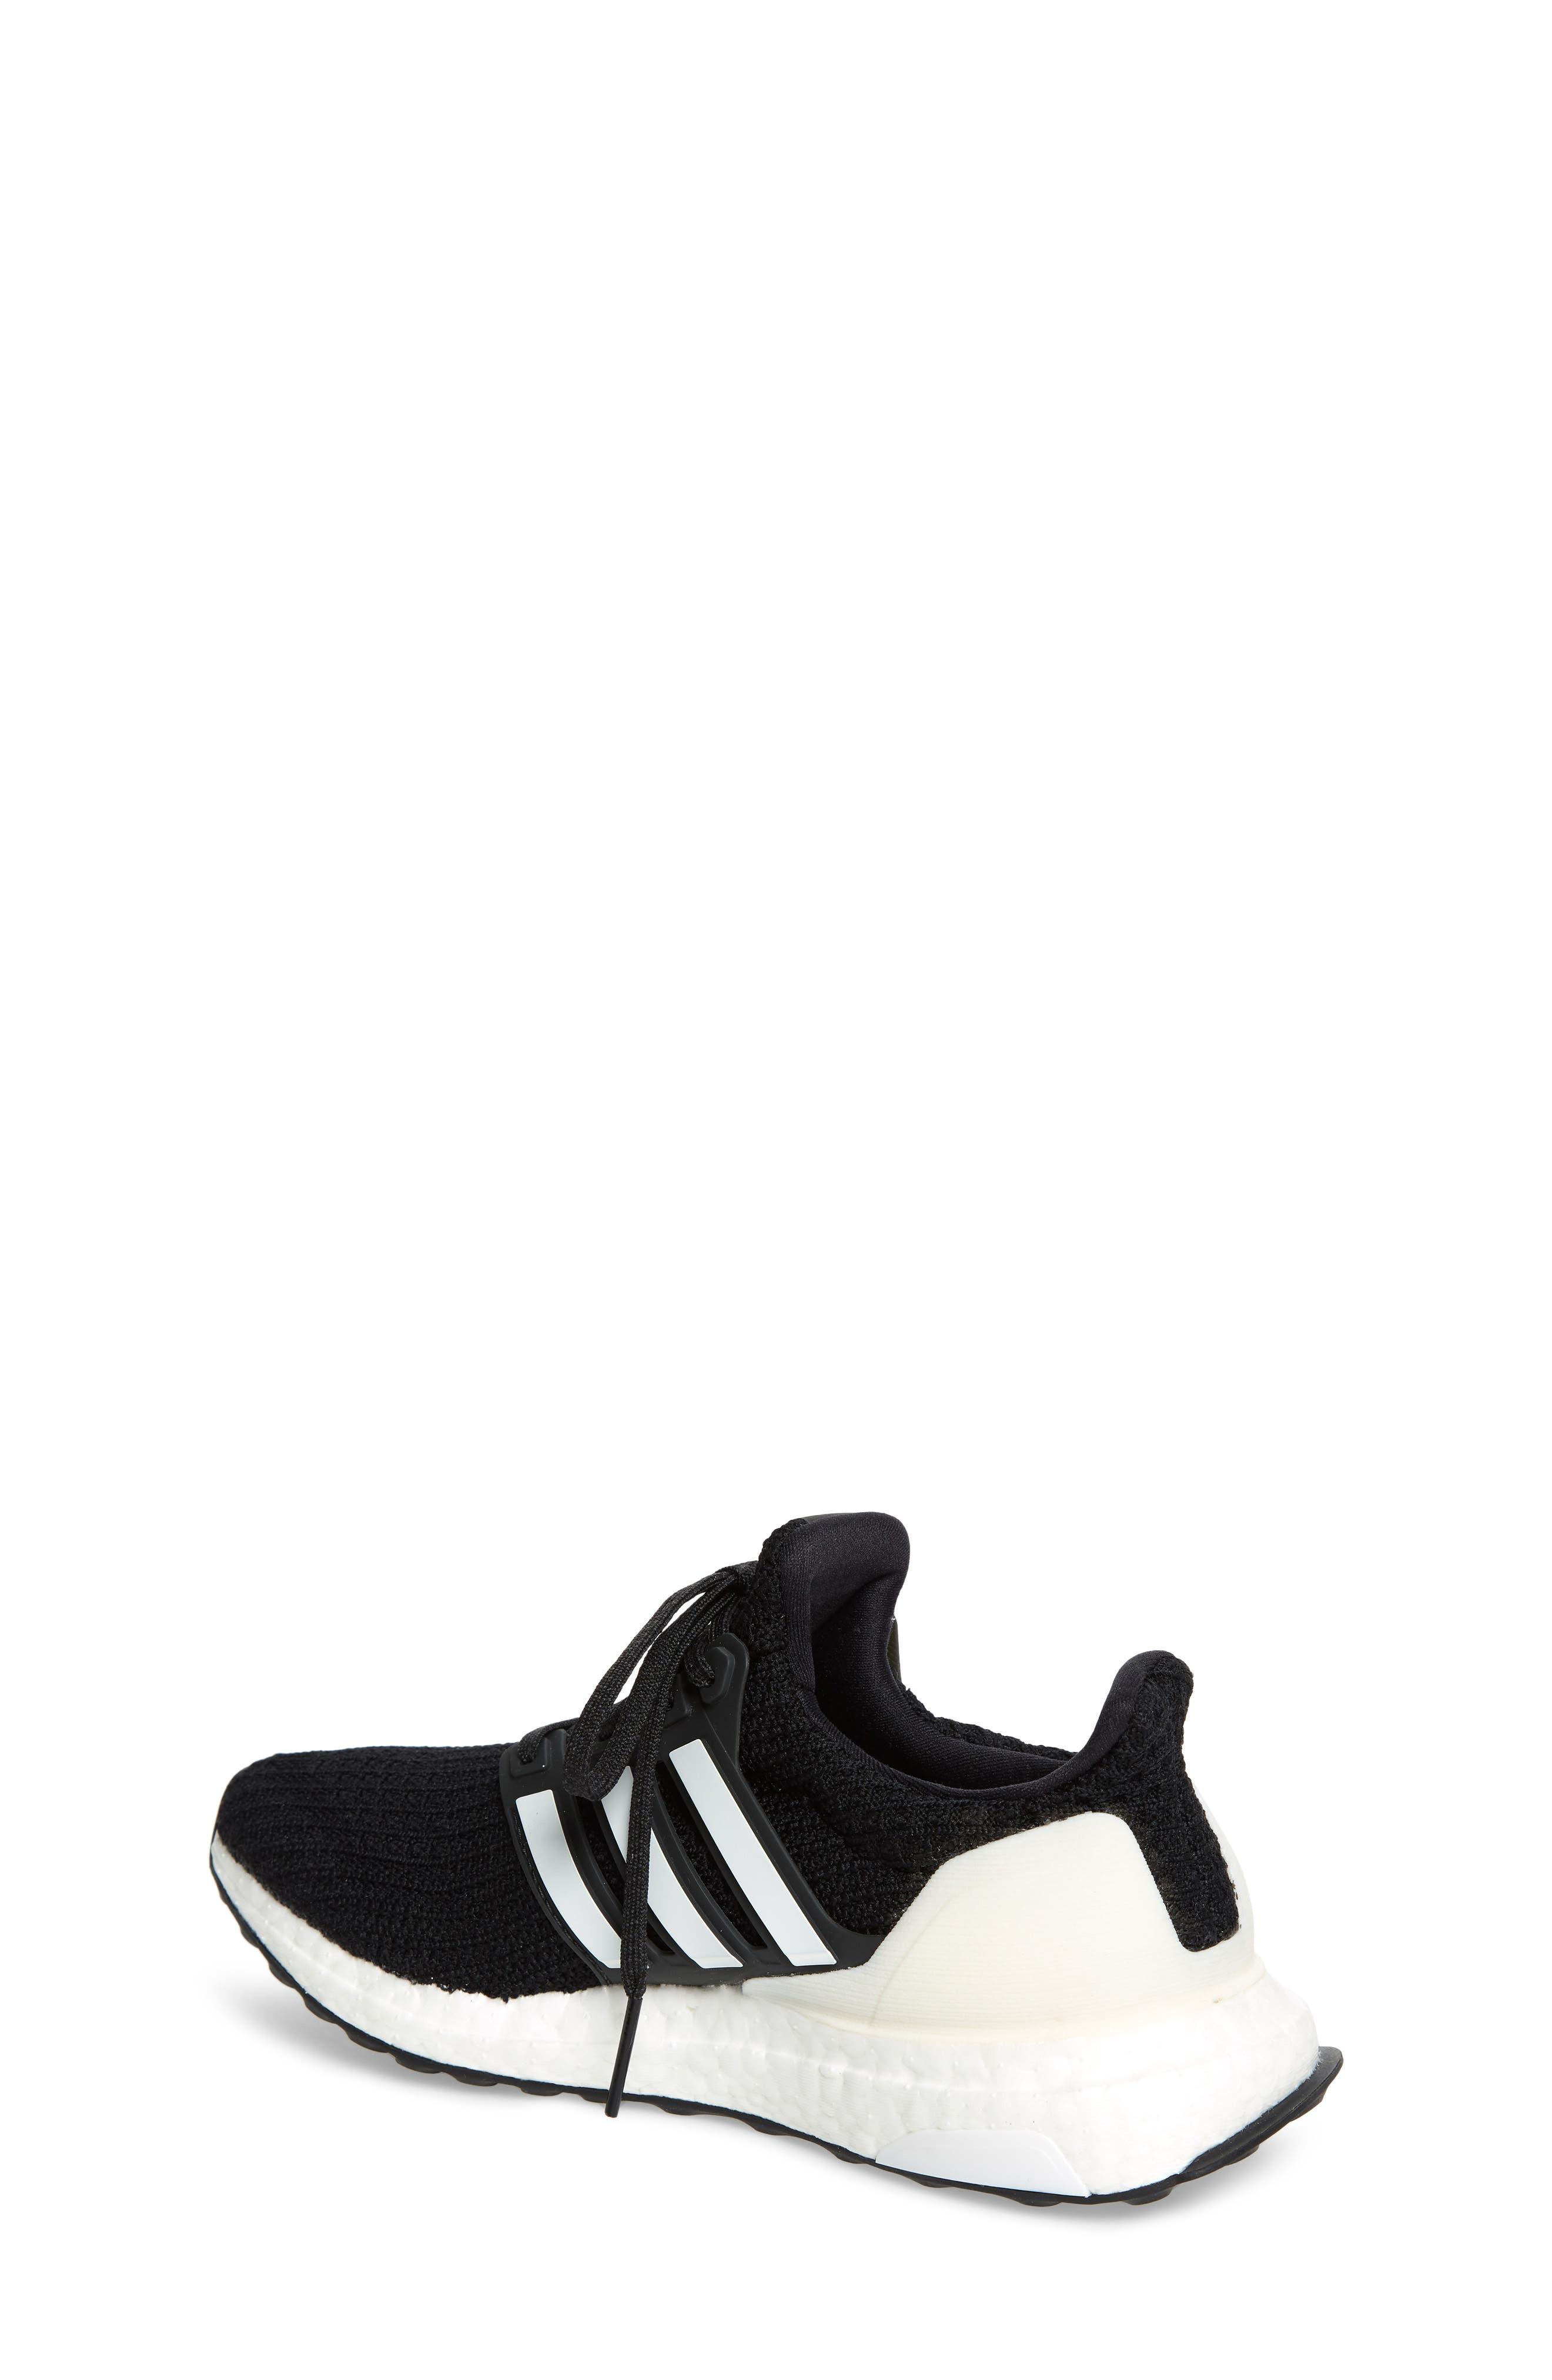 UltraBoost Sneaker,                             Alternate thumbnail 2, color,                             BLACK/ CLOUD WHITE/ CARBON